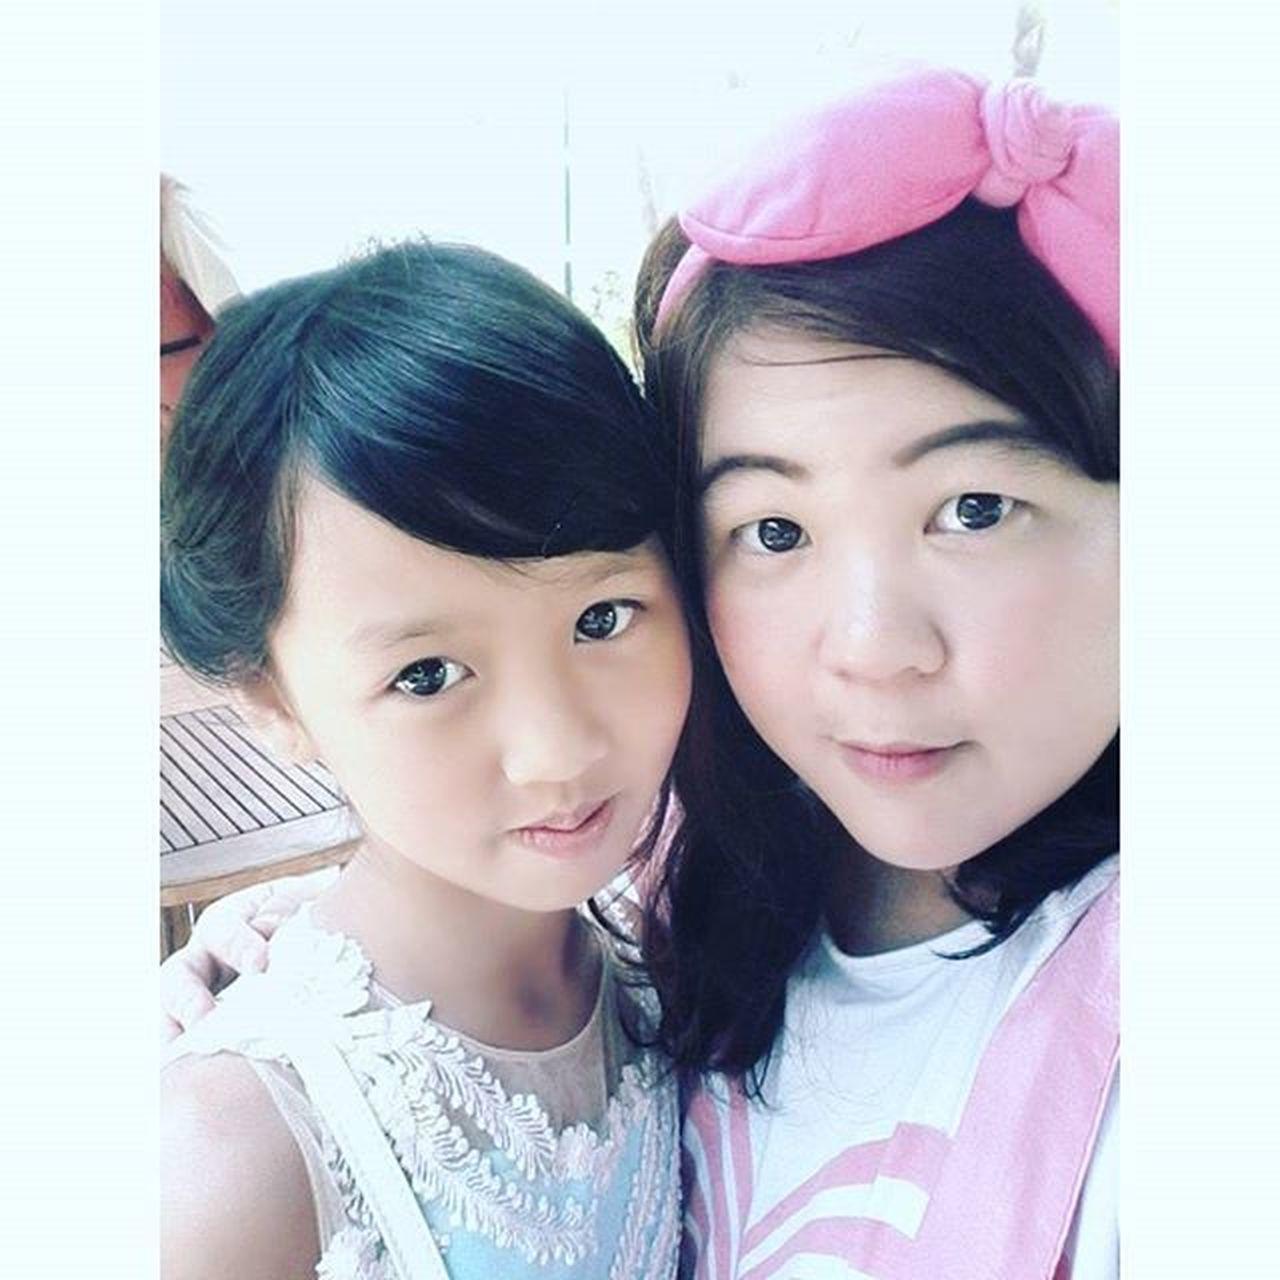 Wif jia-jia on liang-liang bday party. Kaliurang Explorekaliurang Griyapersadahotel Birthdayparty Hosting MC Koreanstyle Makeup Minimalist Instalike Instapic Selfienation Selfie October2015